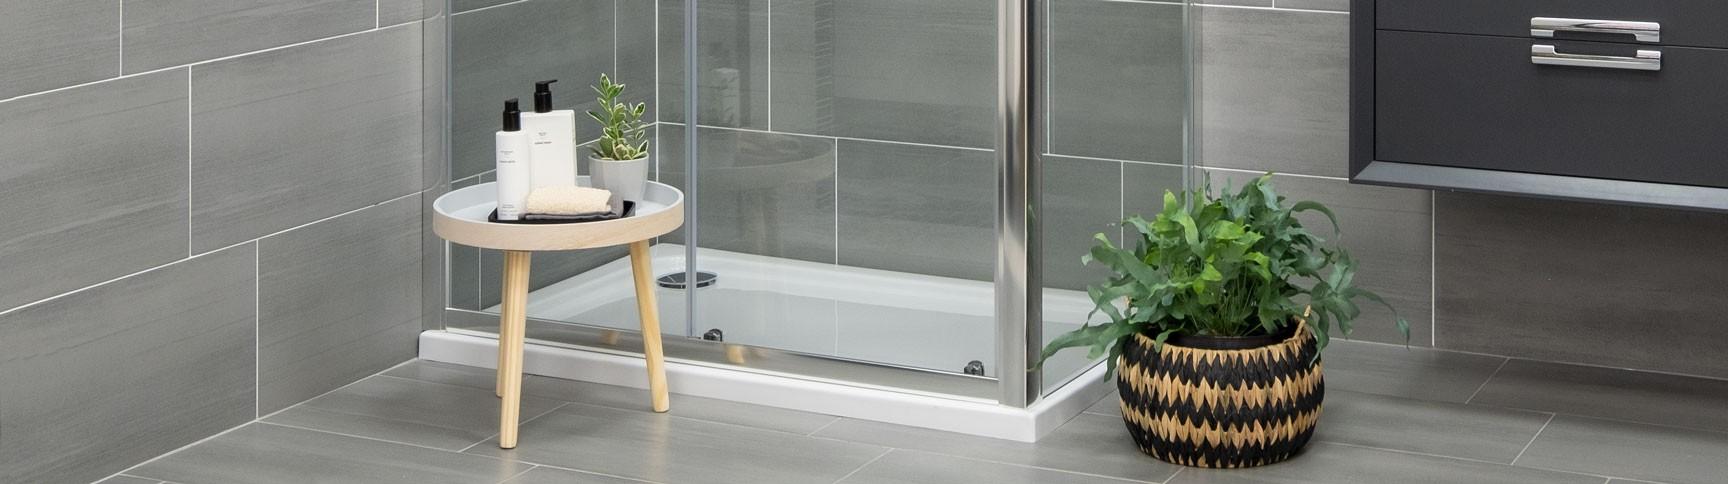 Shower Trays | World of Tiles, Bathrooms & Wood Flooring